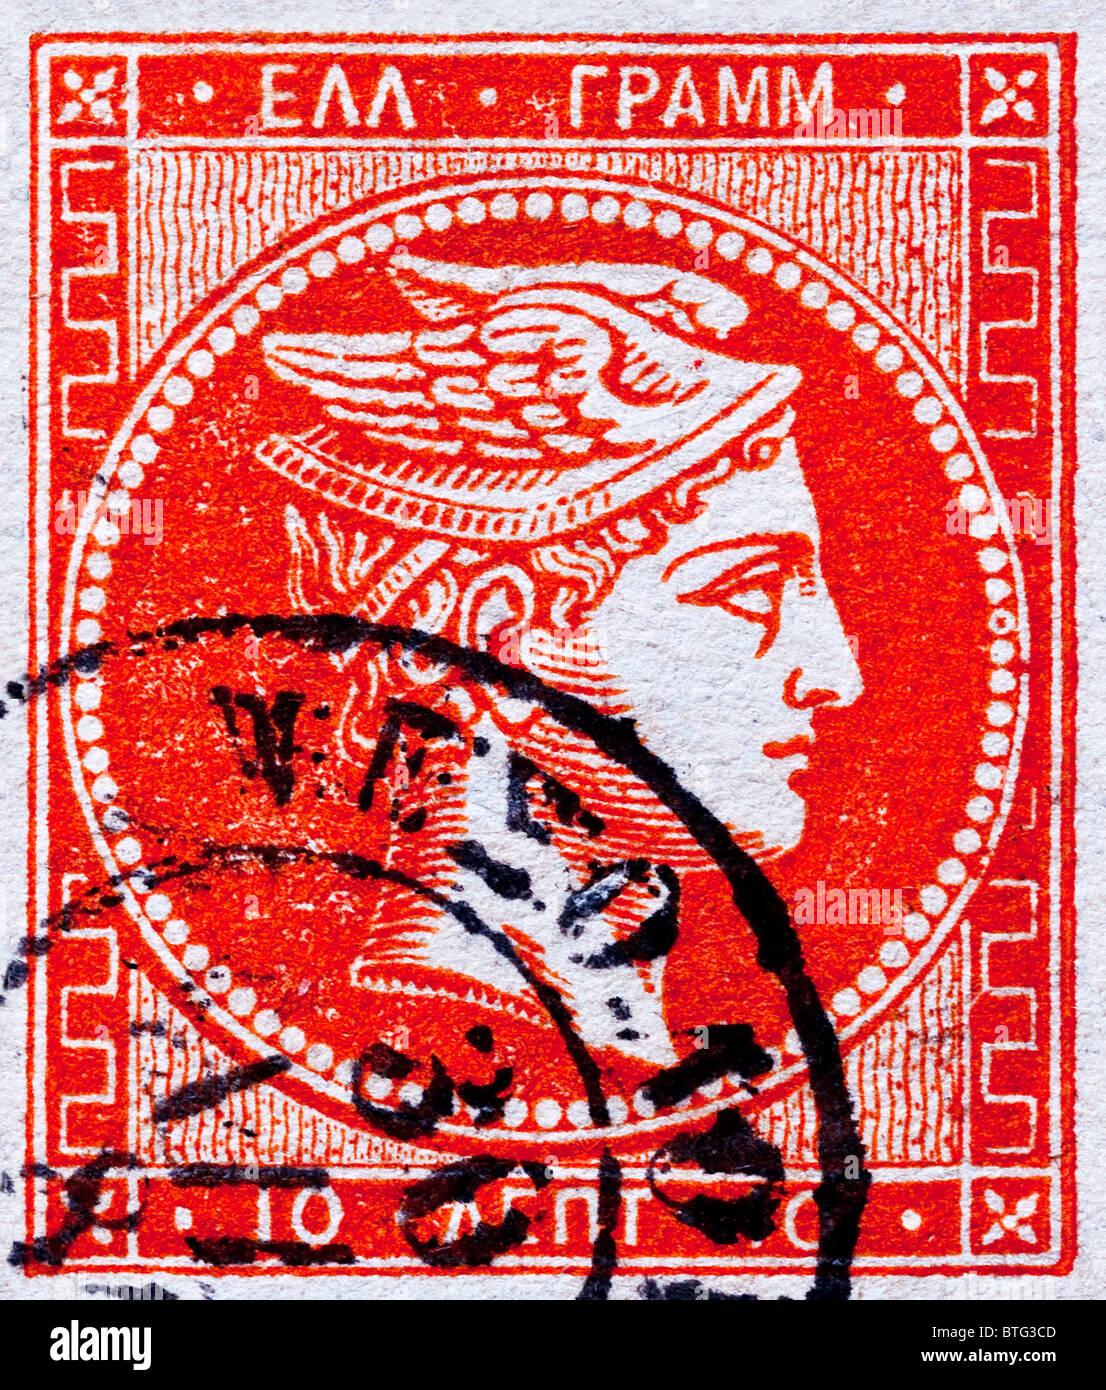 Used 1861-1882 Greek 10 lepta 'Large Hermes Head' definitive postage stamp. - Stock Image